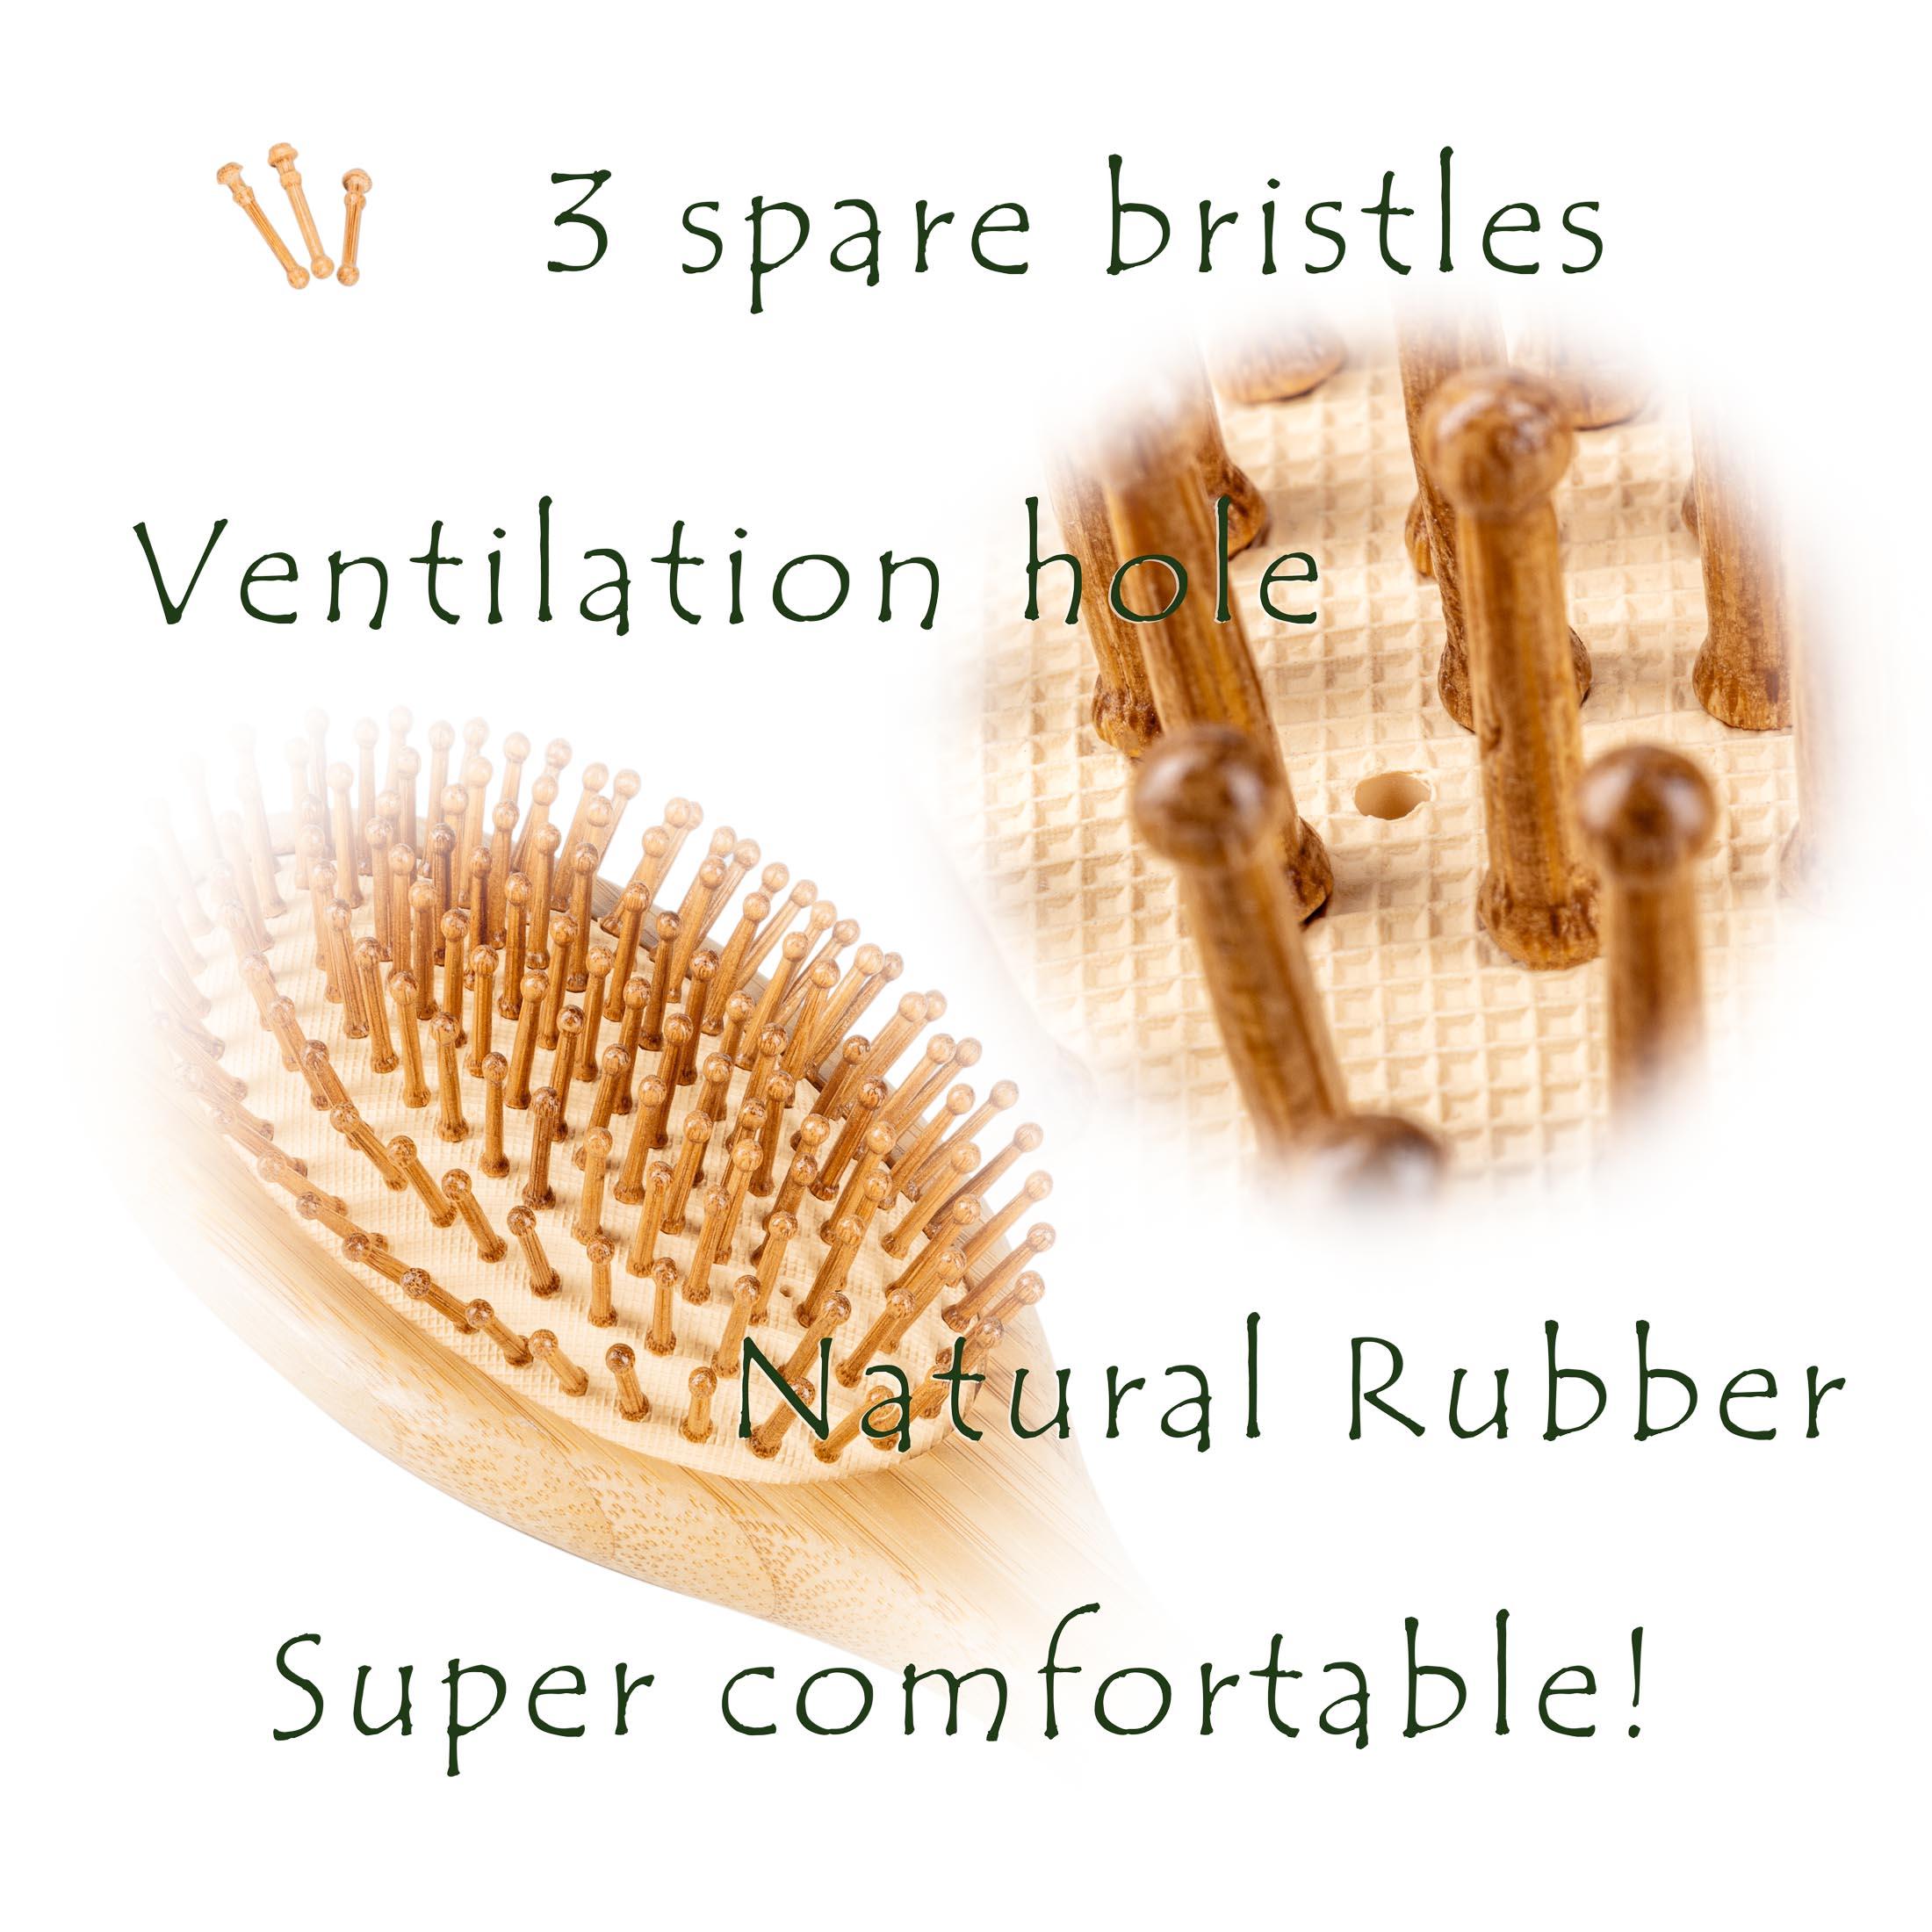 Pet Brush extra bristles and hole - Amazon Product Photography Sample